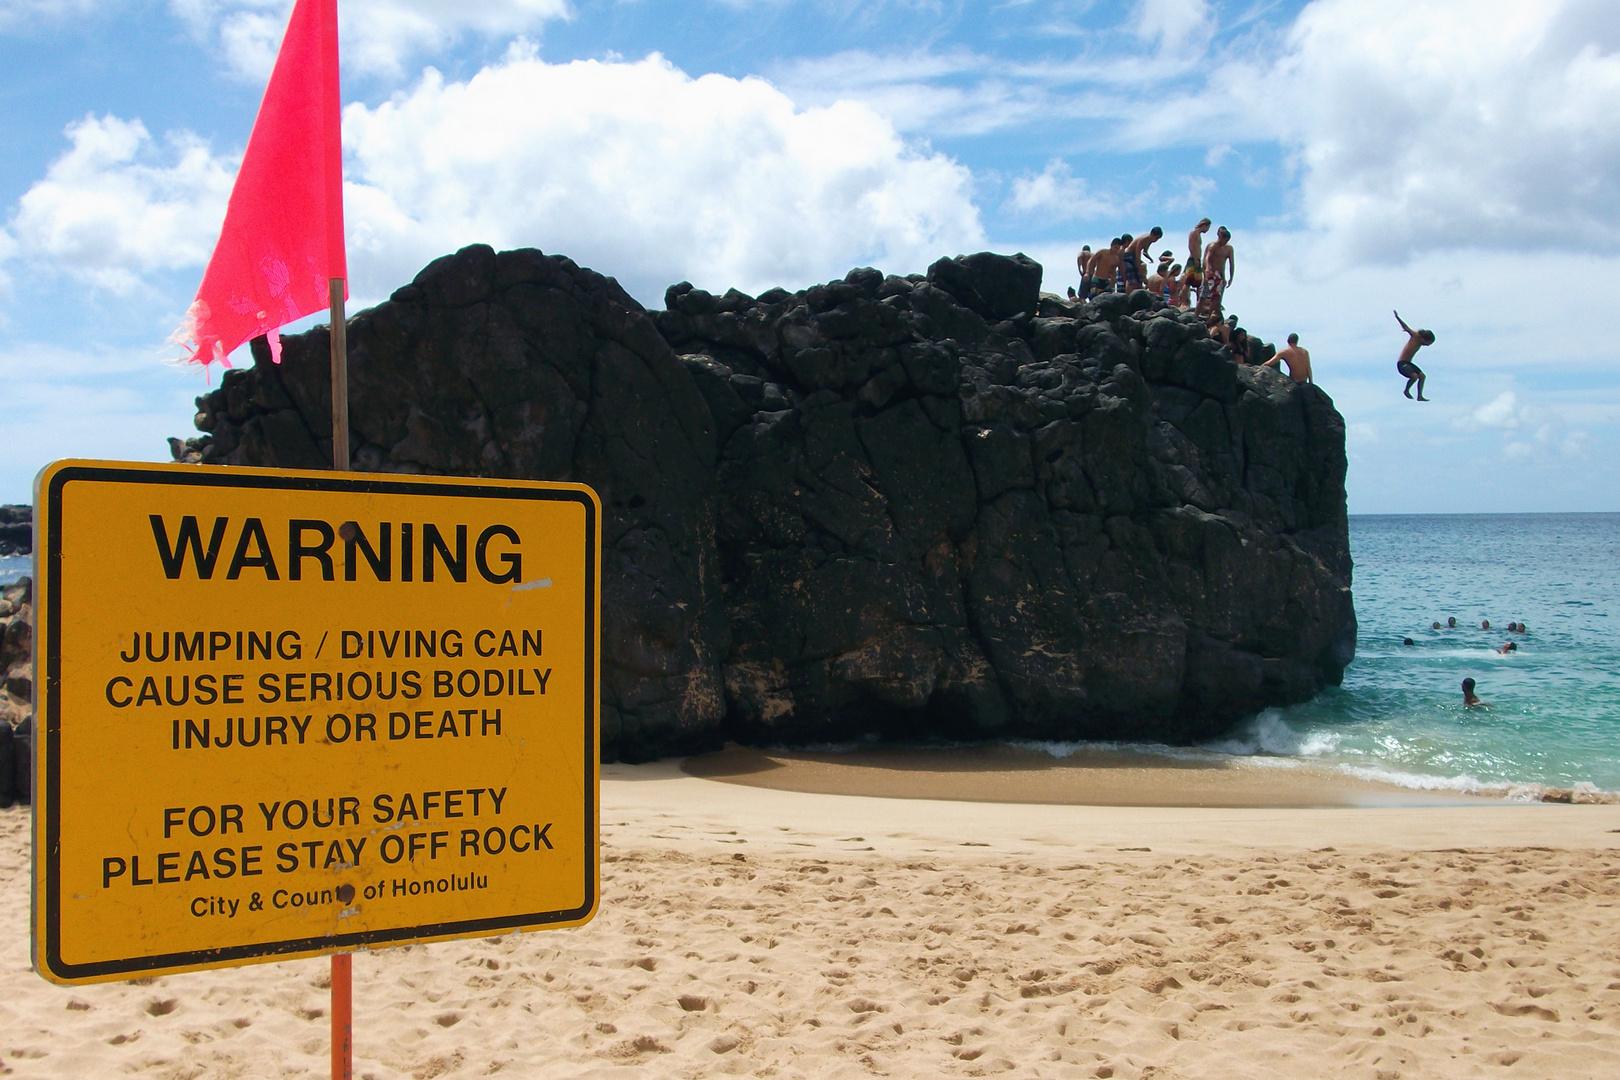 Please-Stay-Off-Rock_Hawaii_Ohau